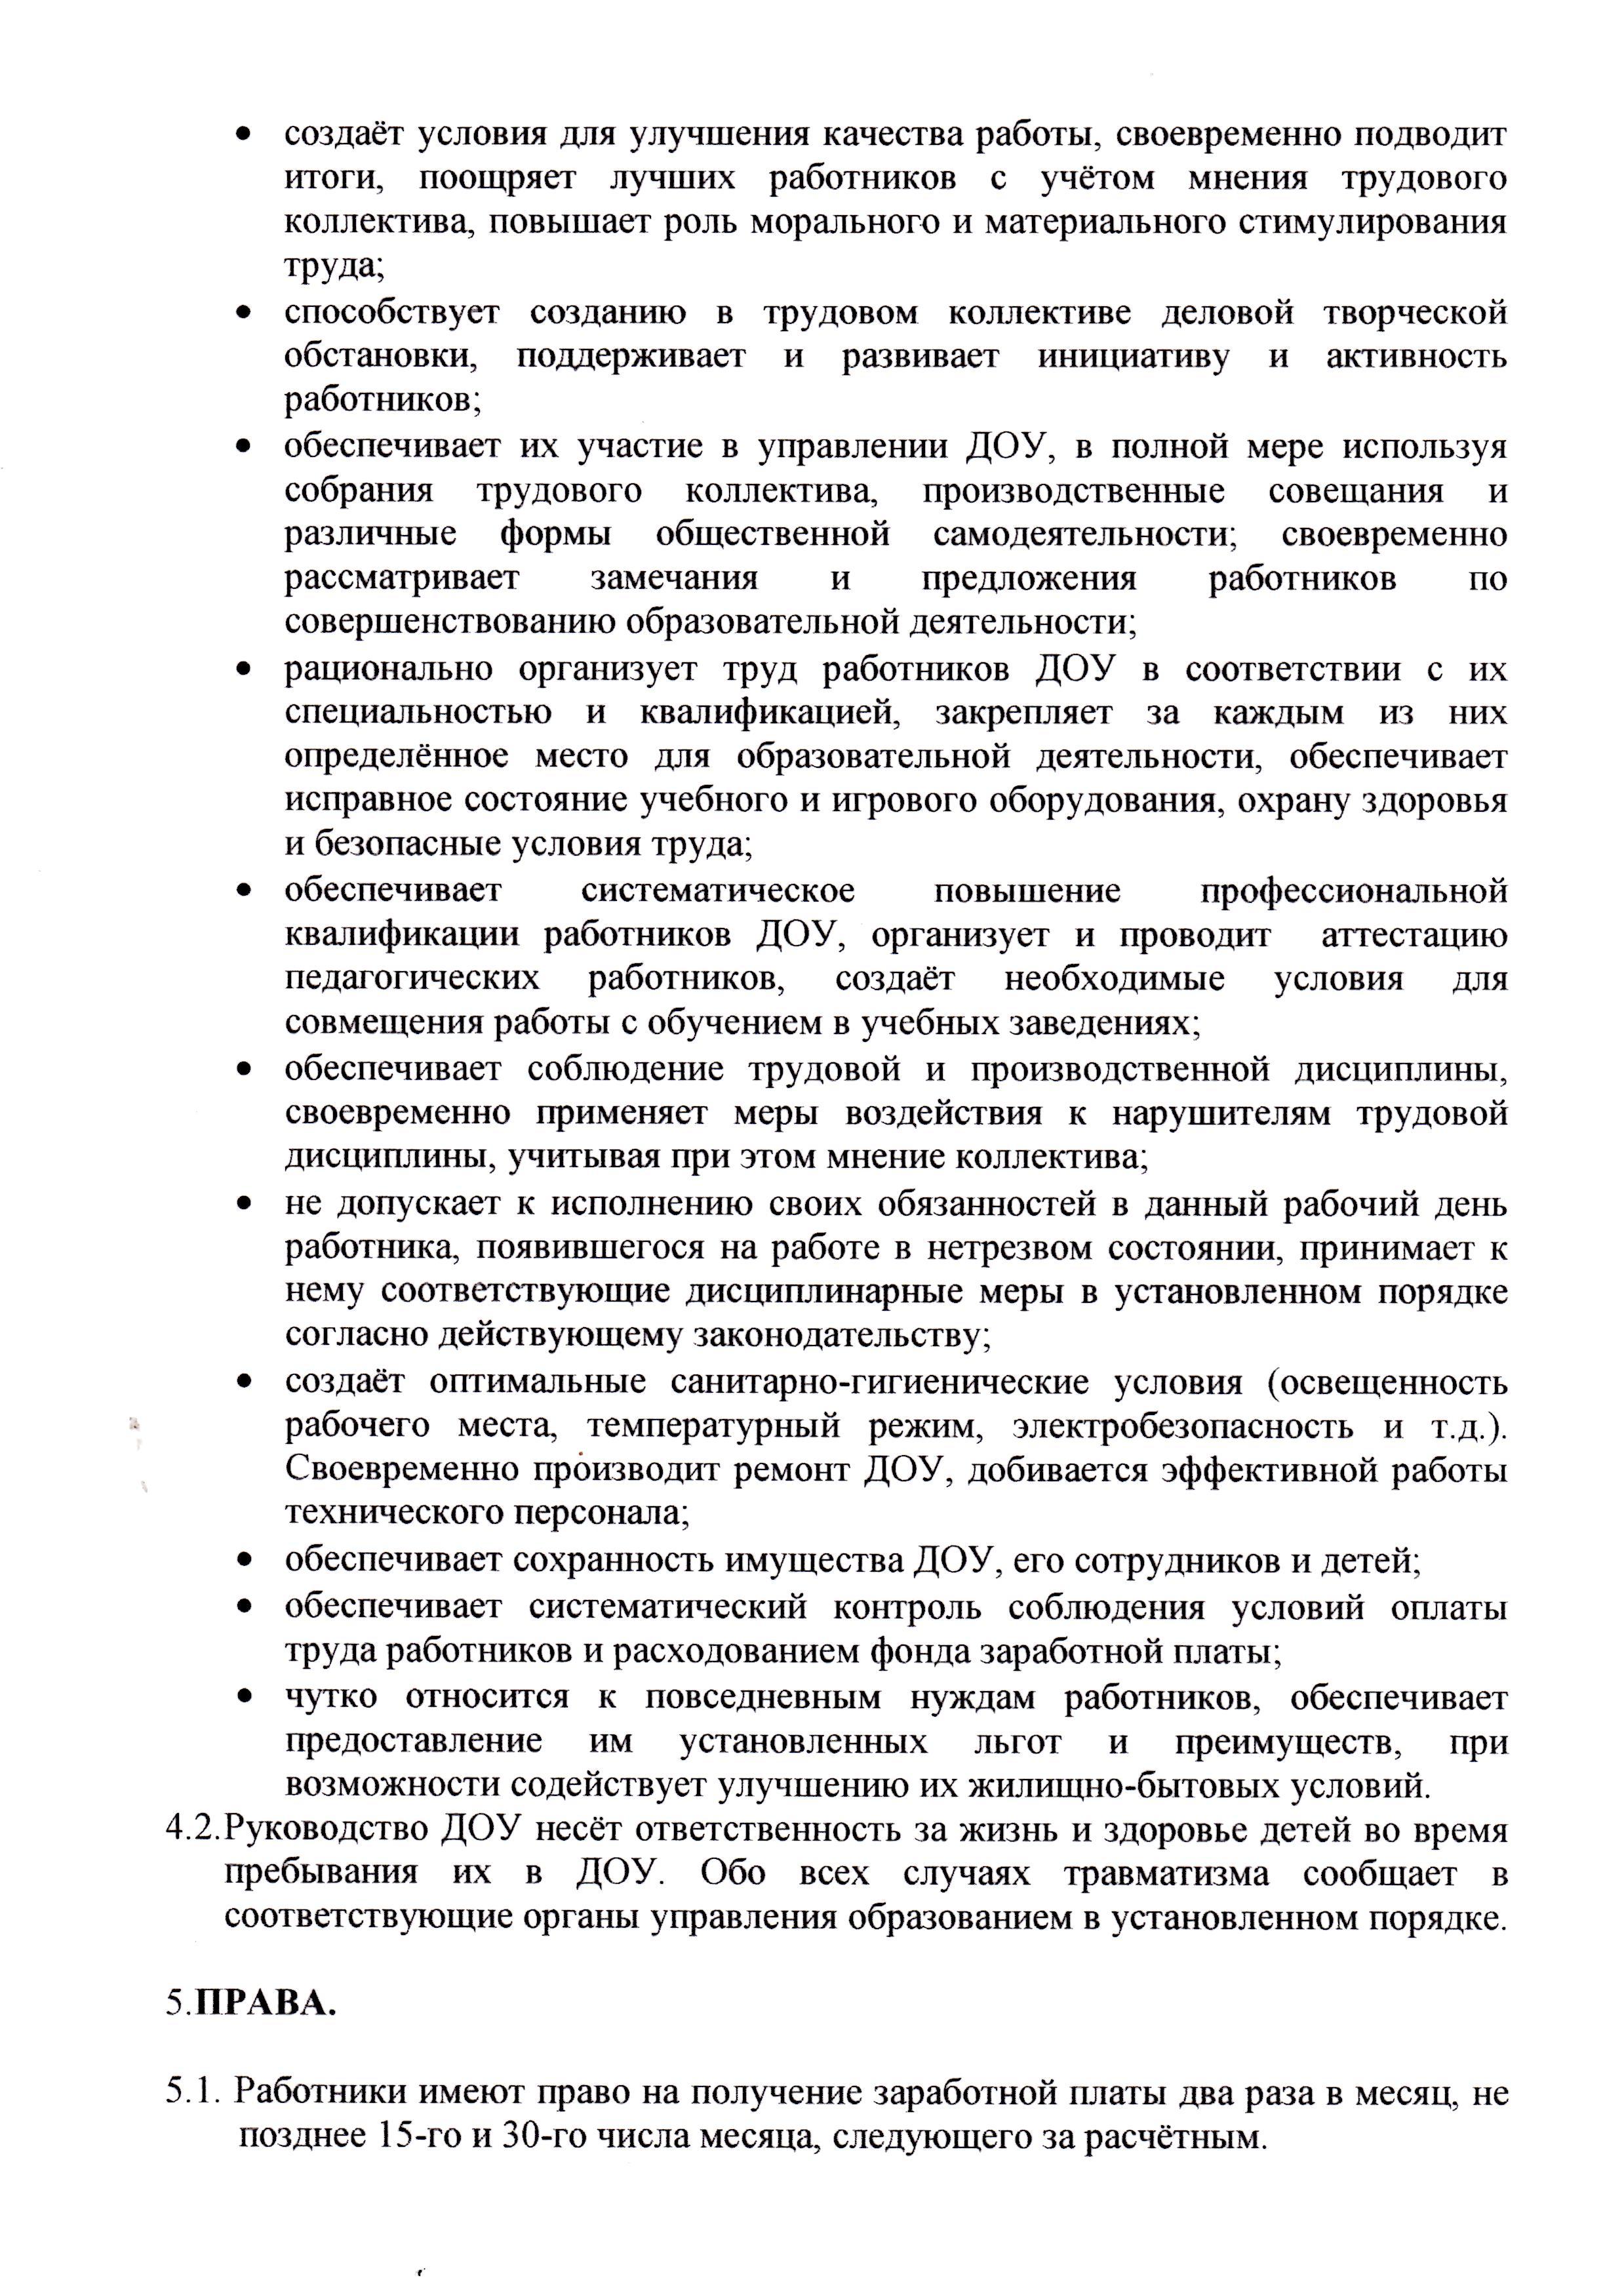 img309